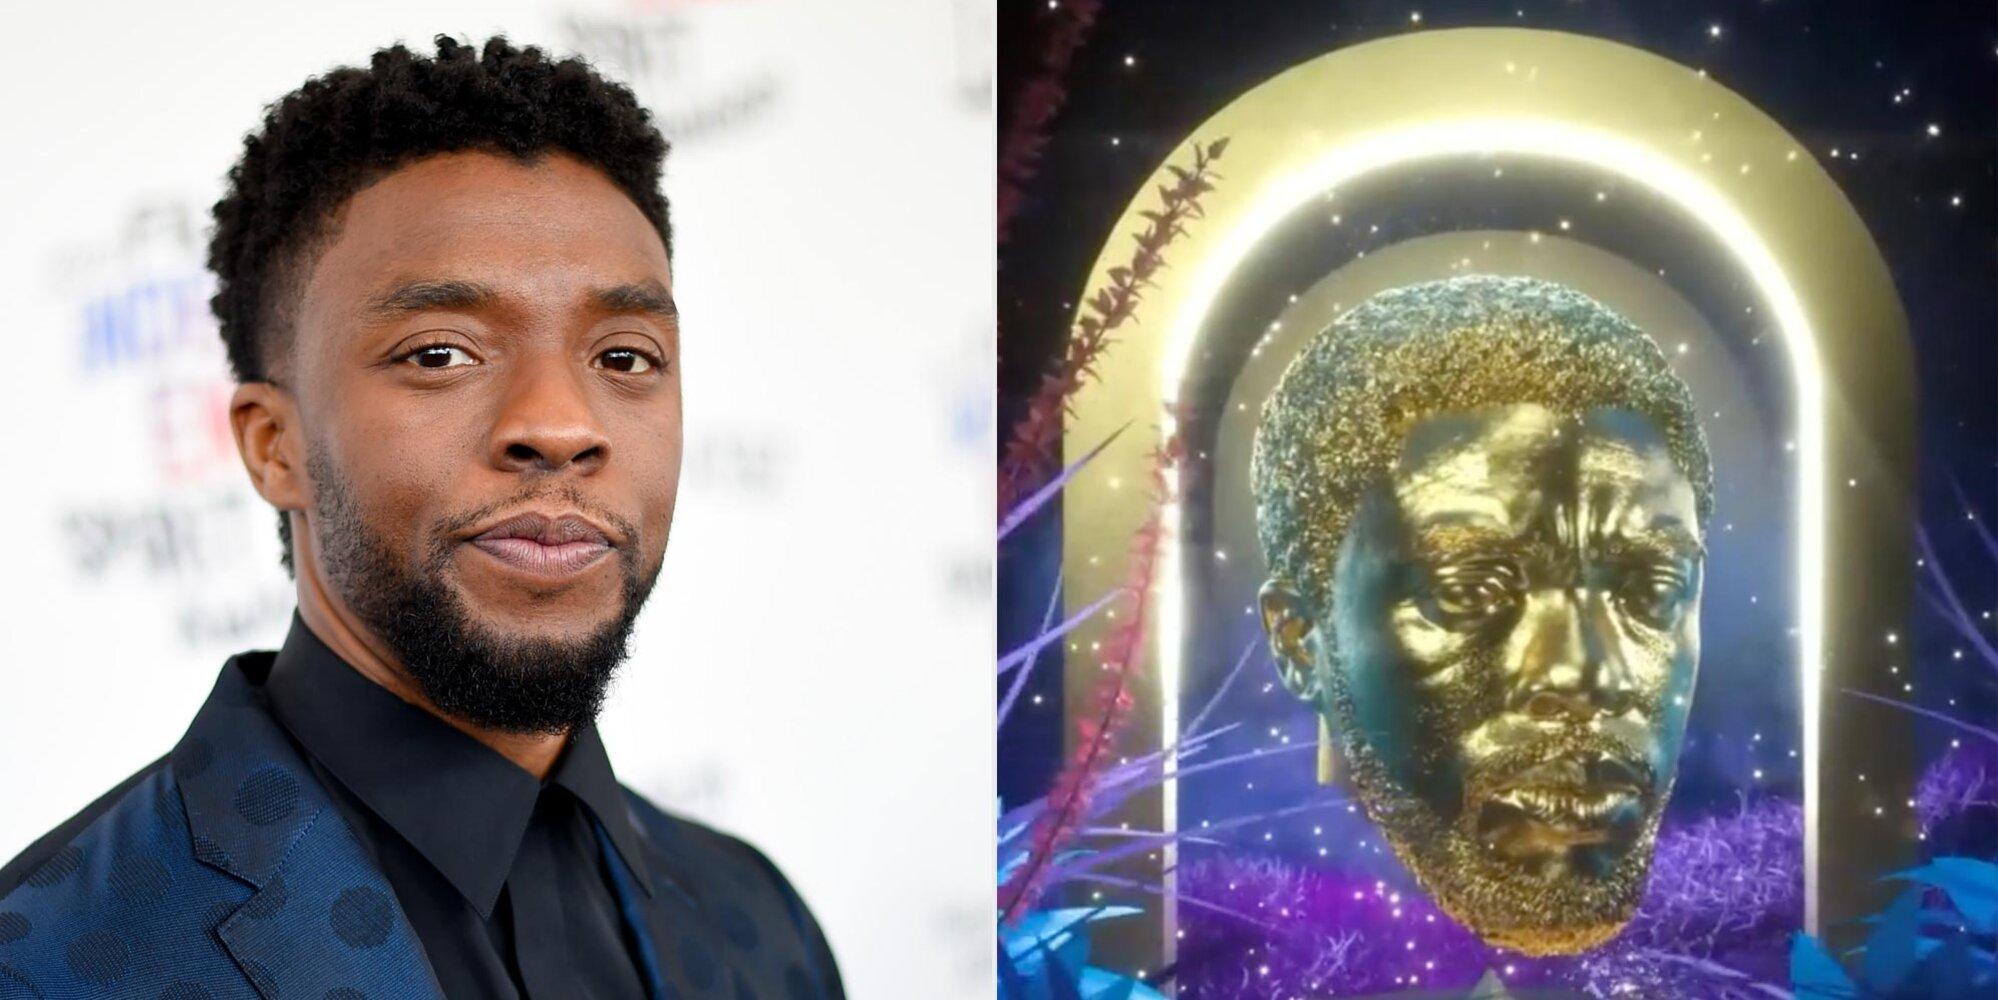 Artist apologizes for 'triggering' Chadwick Boseman NFT Oscars art